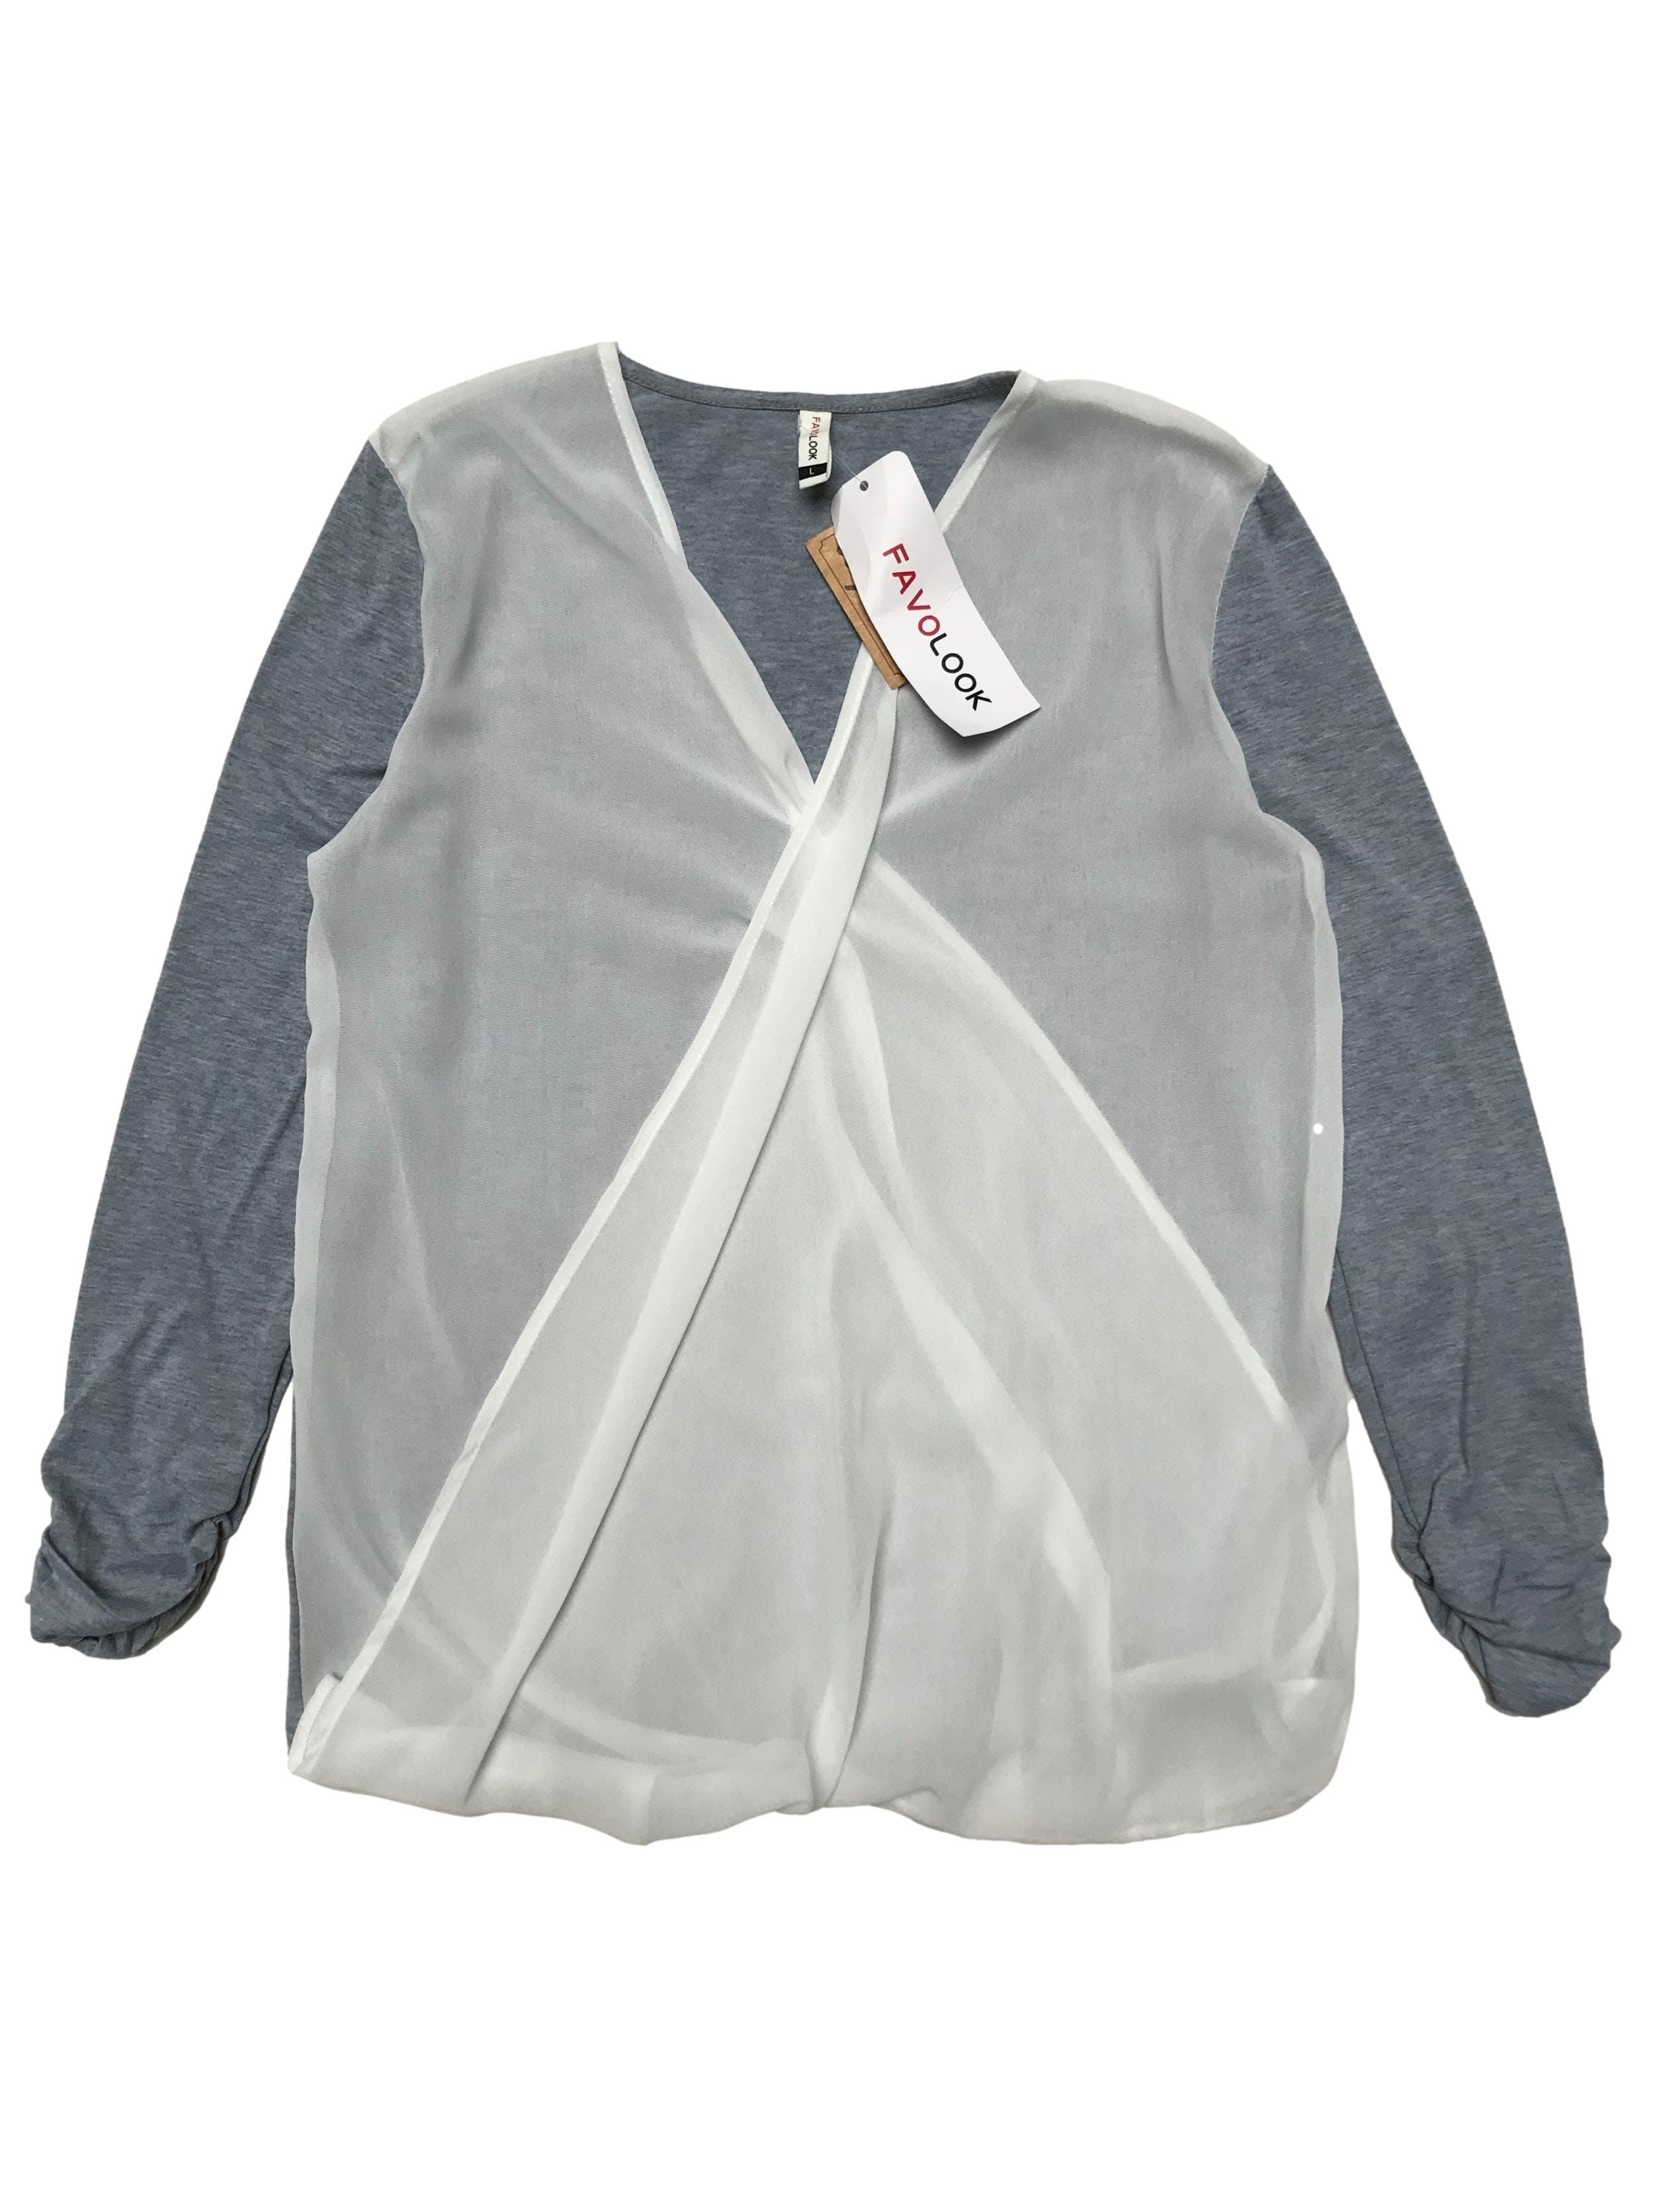 Blusa de tela tipo polo stretch con delantero de gasa cruzada, manga 7/8 con dreapeado. Busto 98cm Largo 60cm. Nuevo con etiqueta.